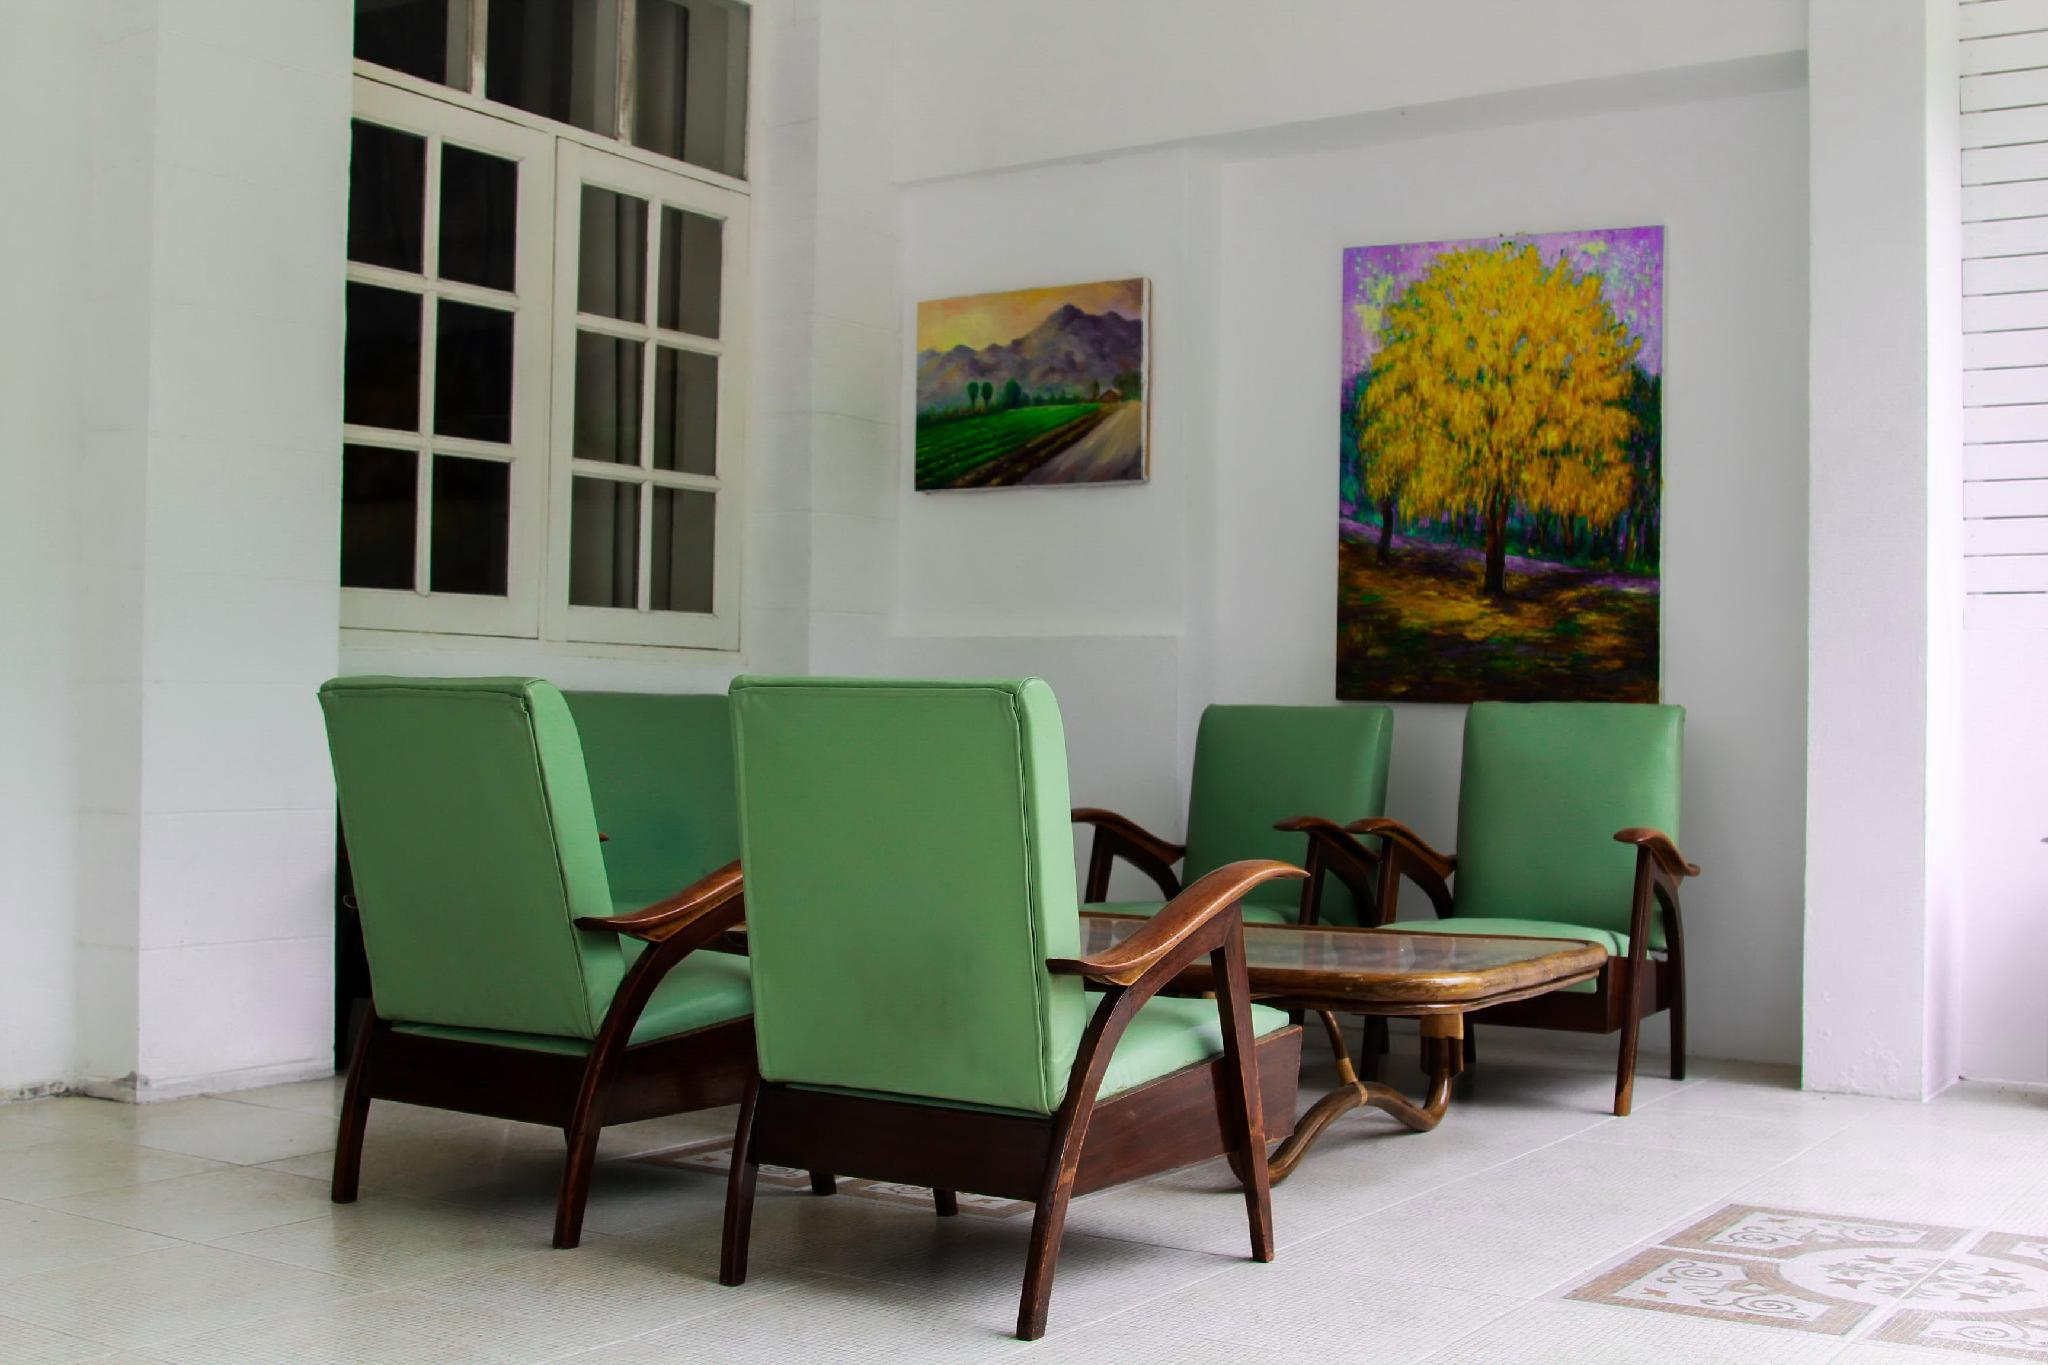 River Kwai Escape Private Villa Resort วิลลา 9 ห้องนอน 9 ห้องน้ำส่วนตัว ขนาด 3200 ตร.ม. – แม่น้ำแคว